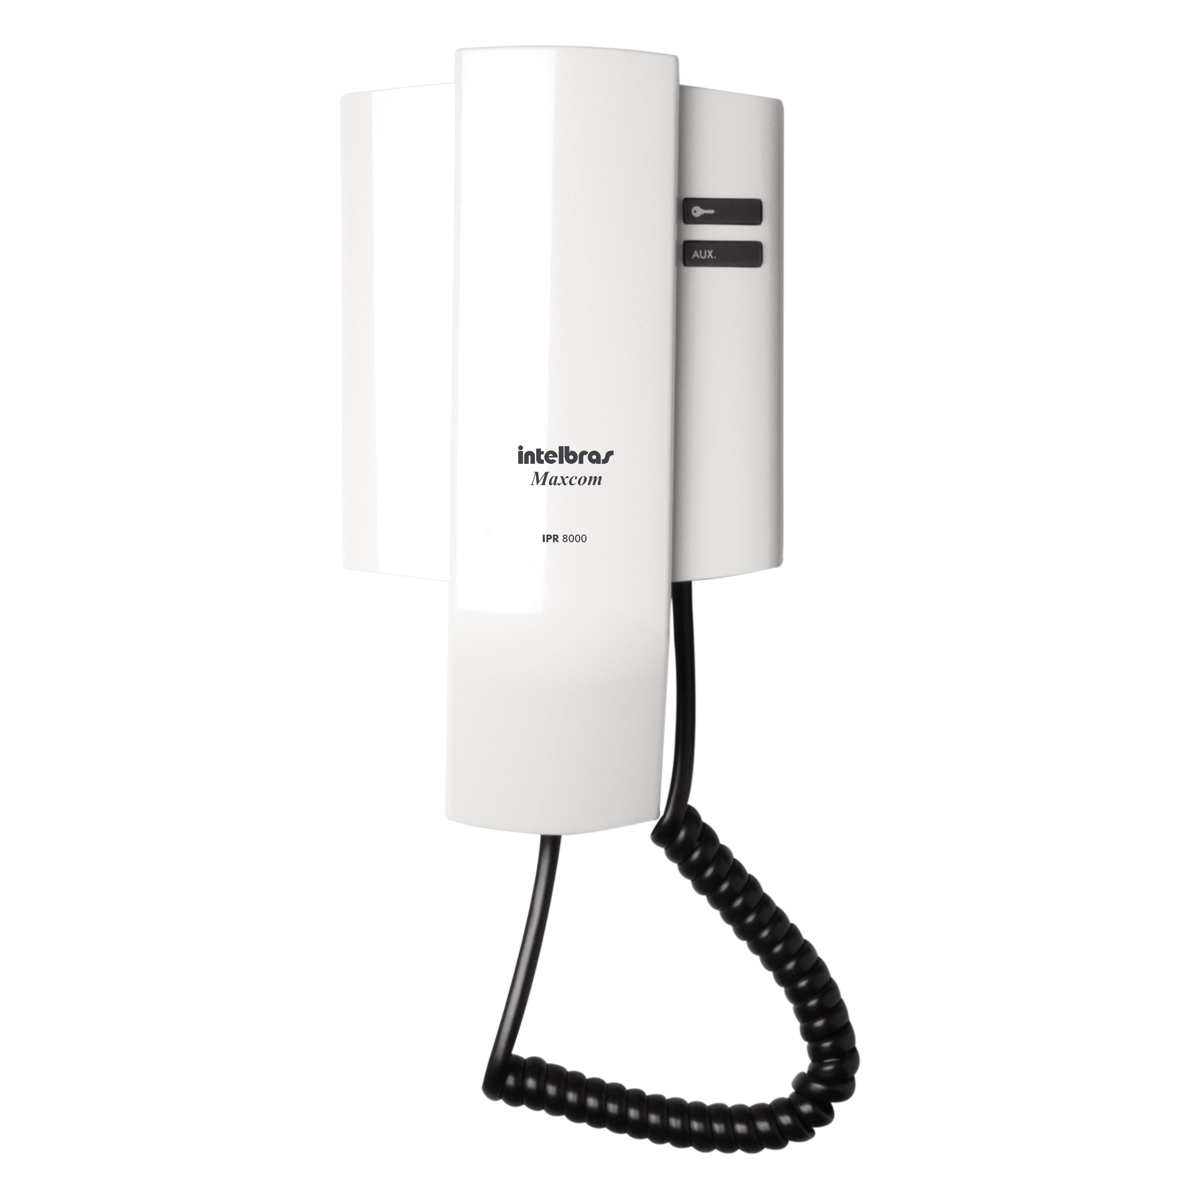 Extensão Interfone / Porteiro IPR 8000 Intelbras